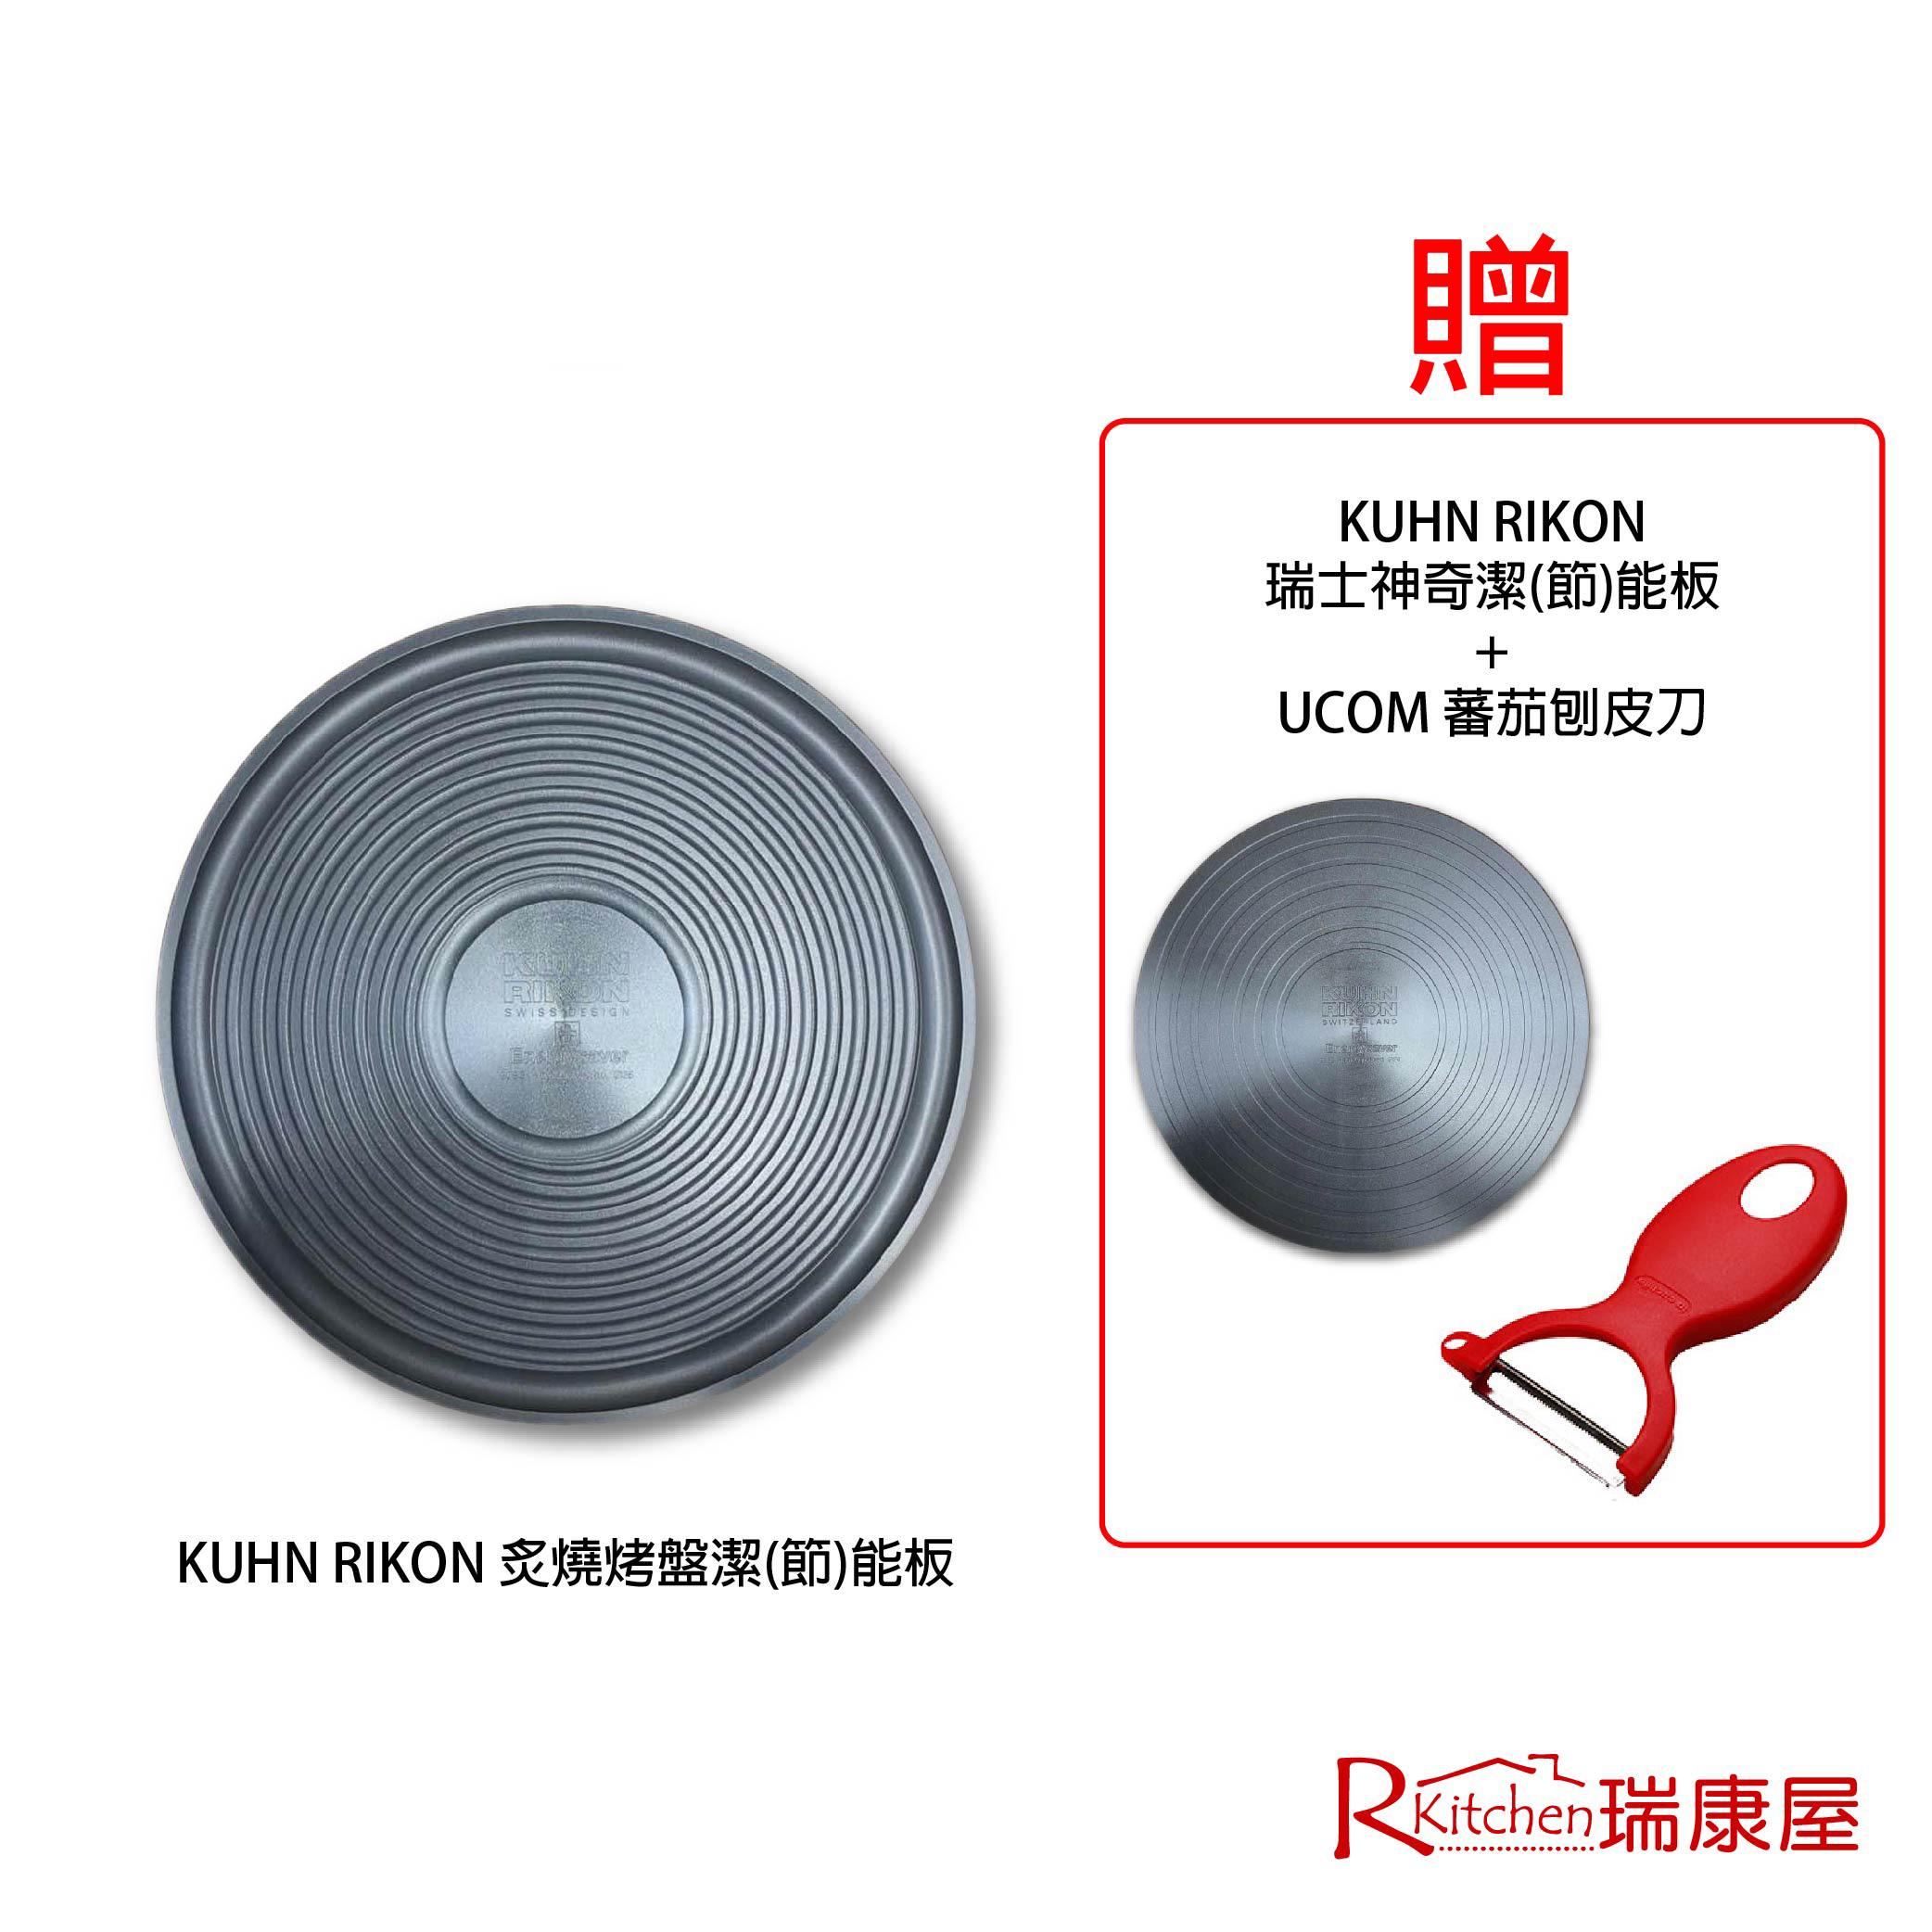 【Kuhn Rikon 瑞康屋】瑞士專利炙燒烤盤式節能板26cm+神奇節能板24cm 贈刨皮刀